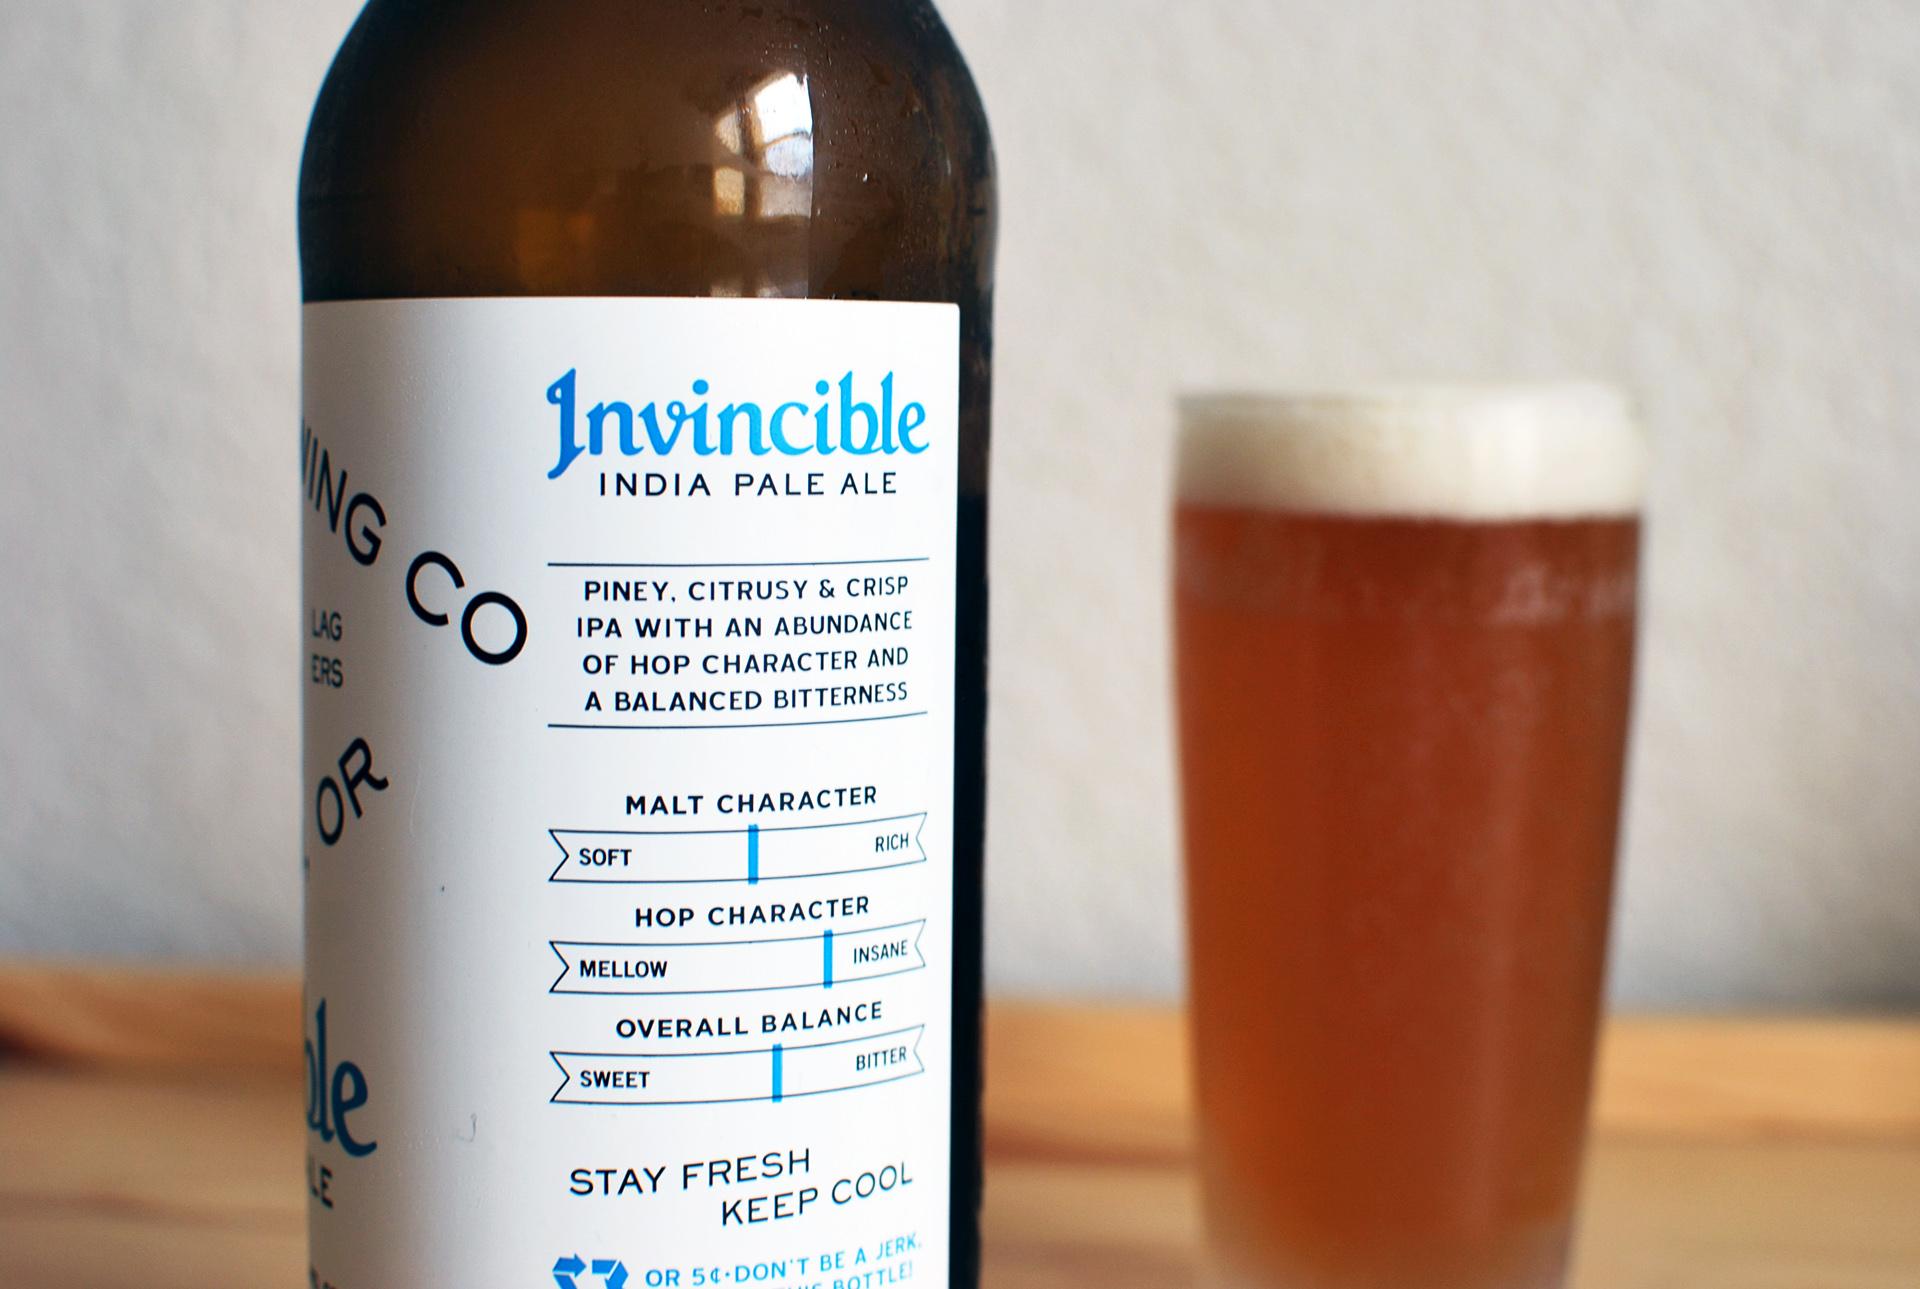 Invincible IPA